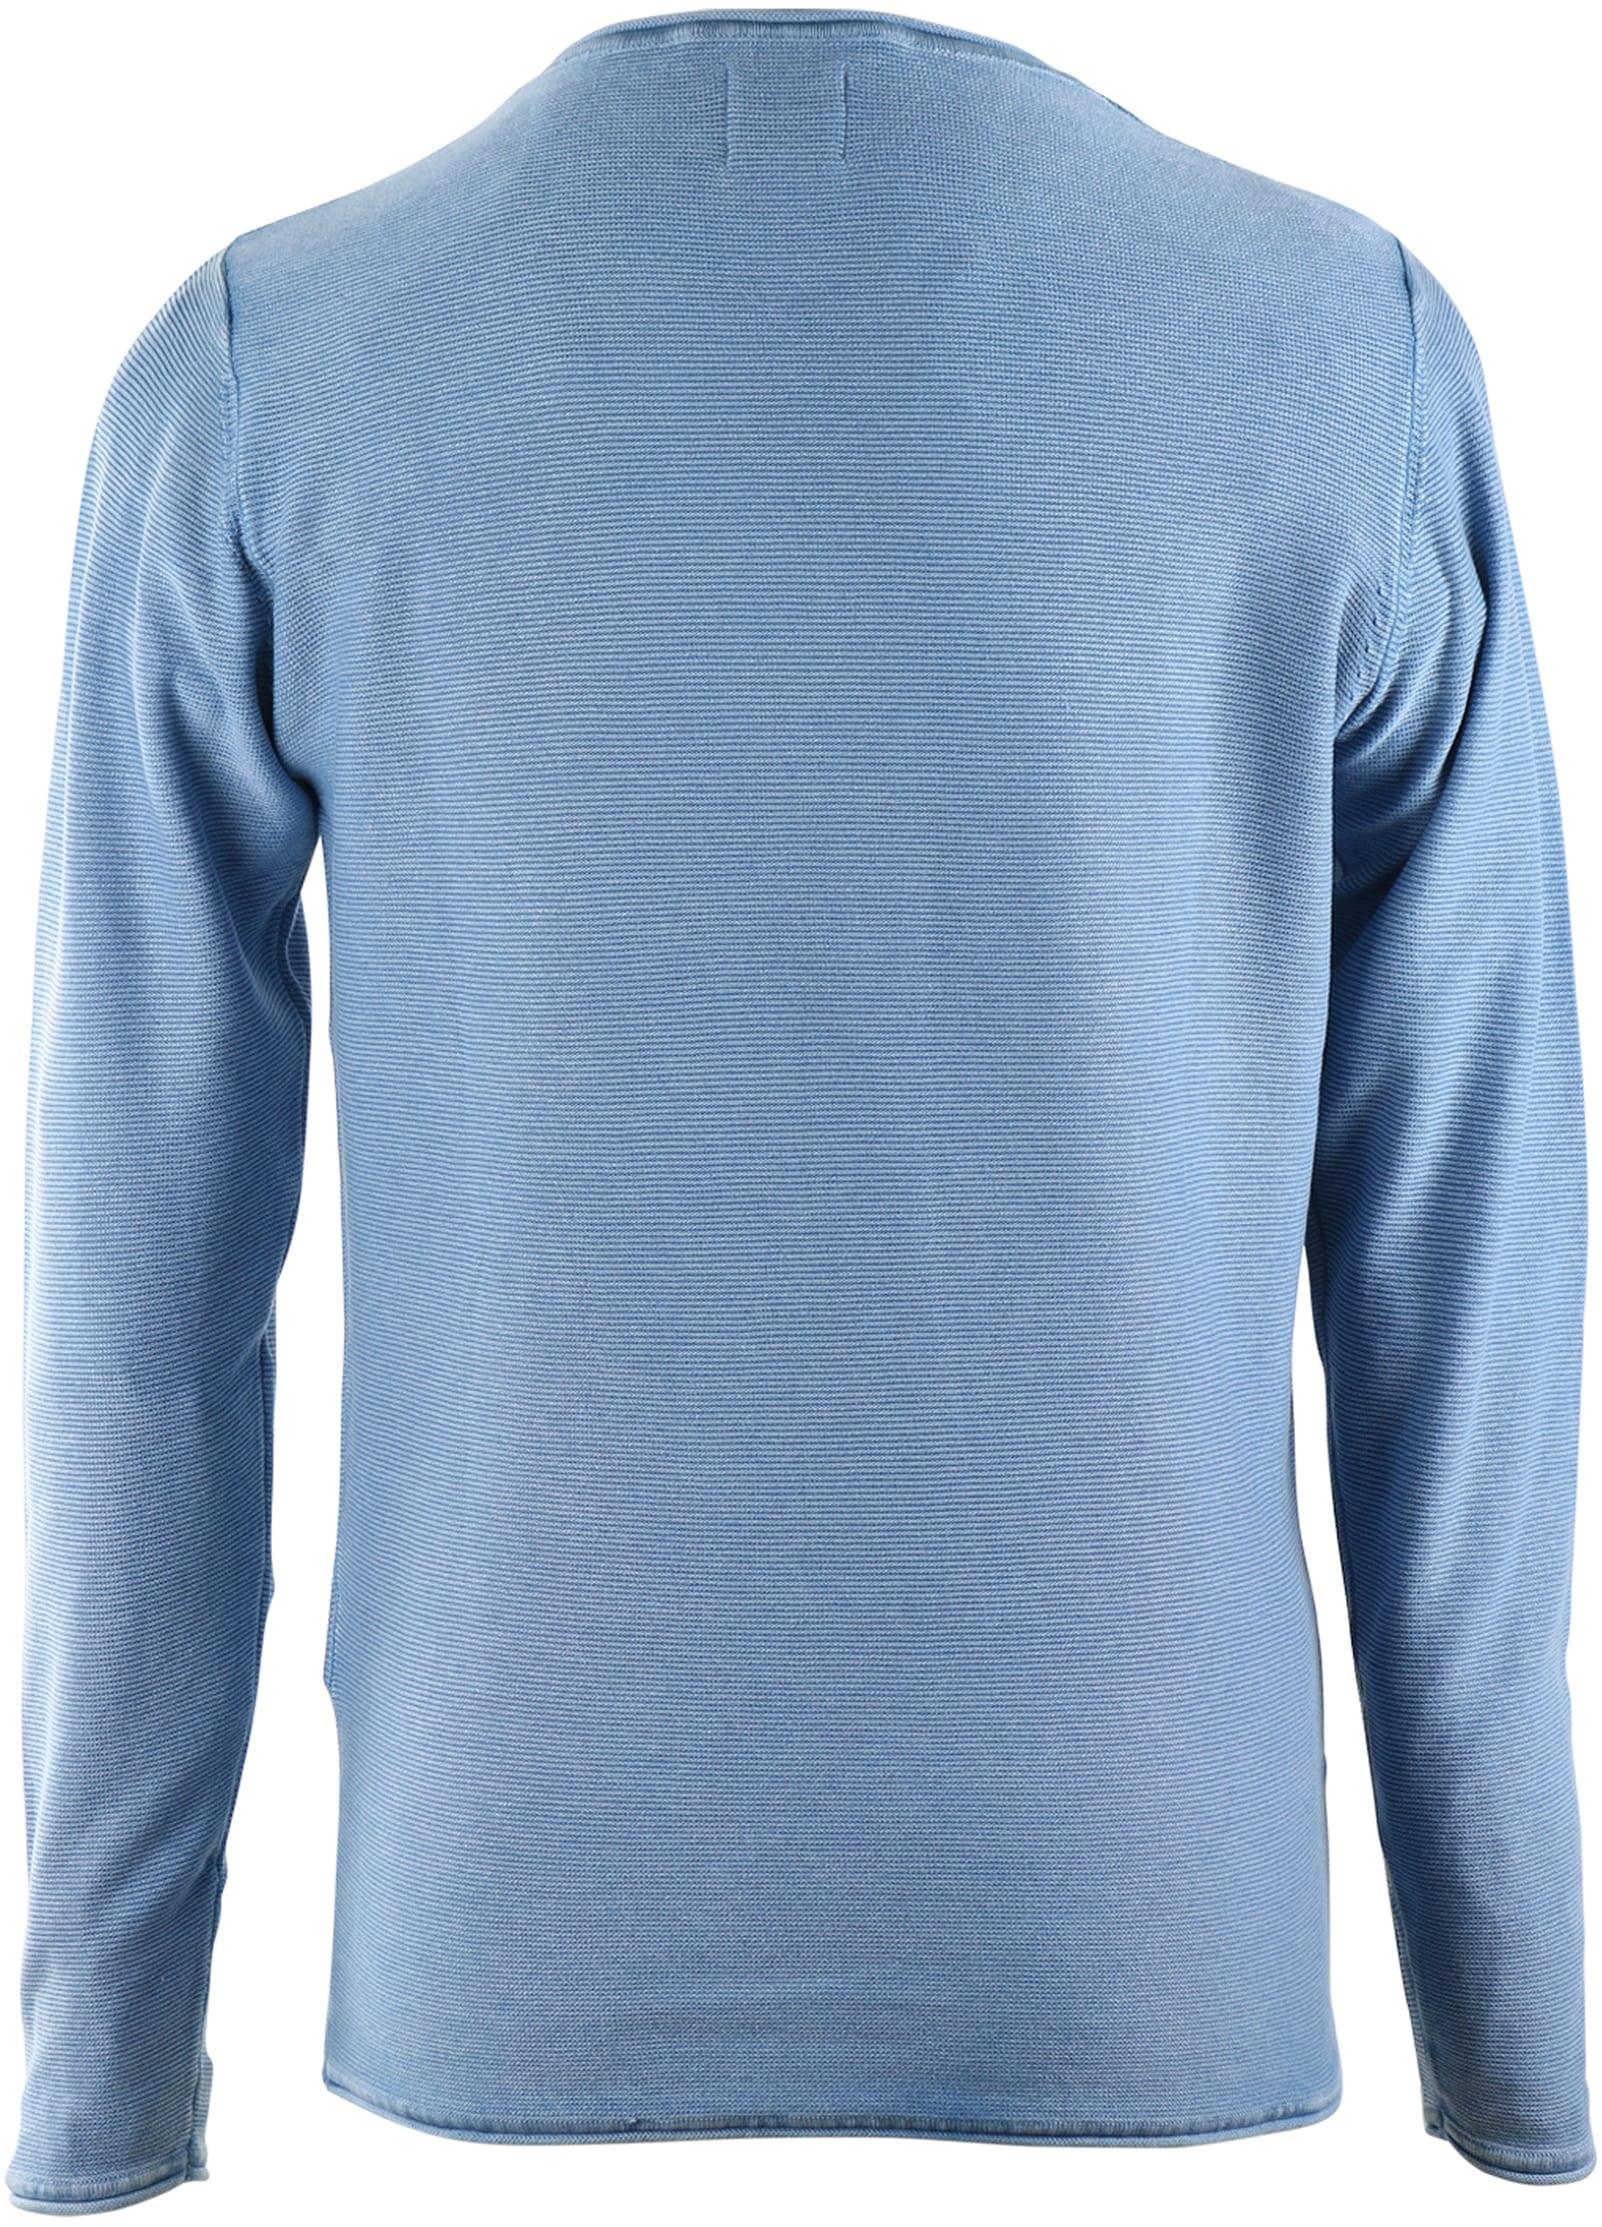 Dstrezzed Pullover Acid Blauw foto 1